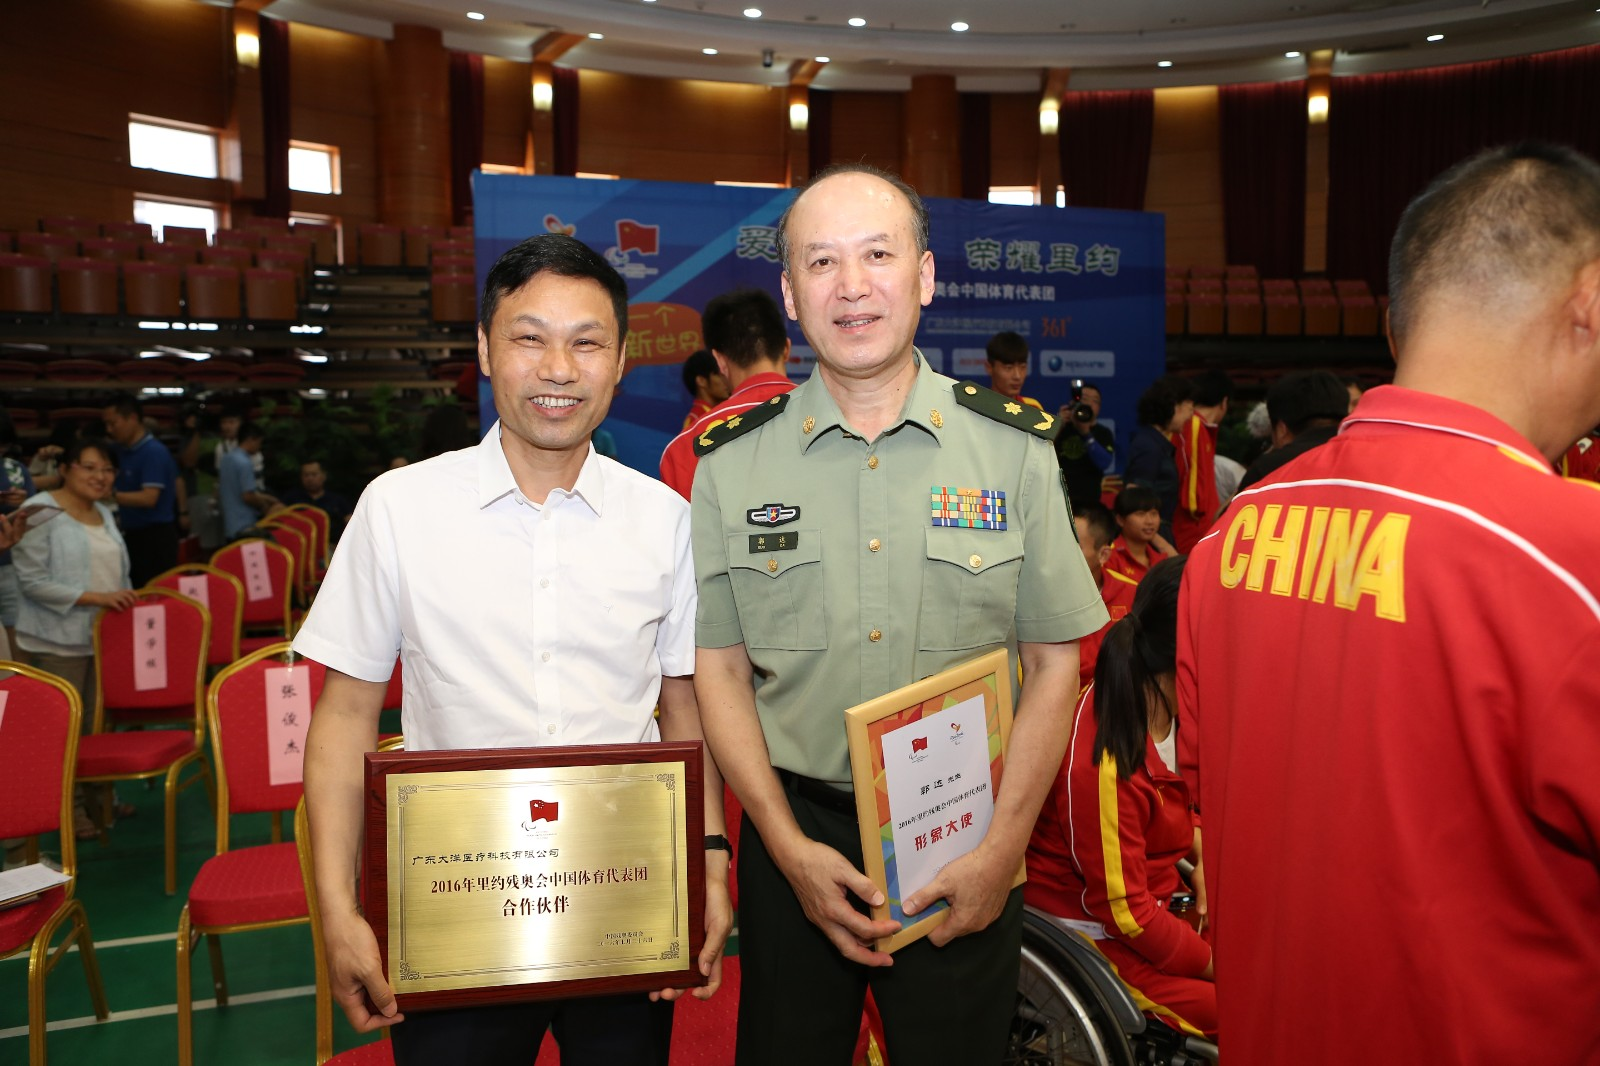 Partner of 2016 Paralymic Games China Delegation